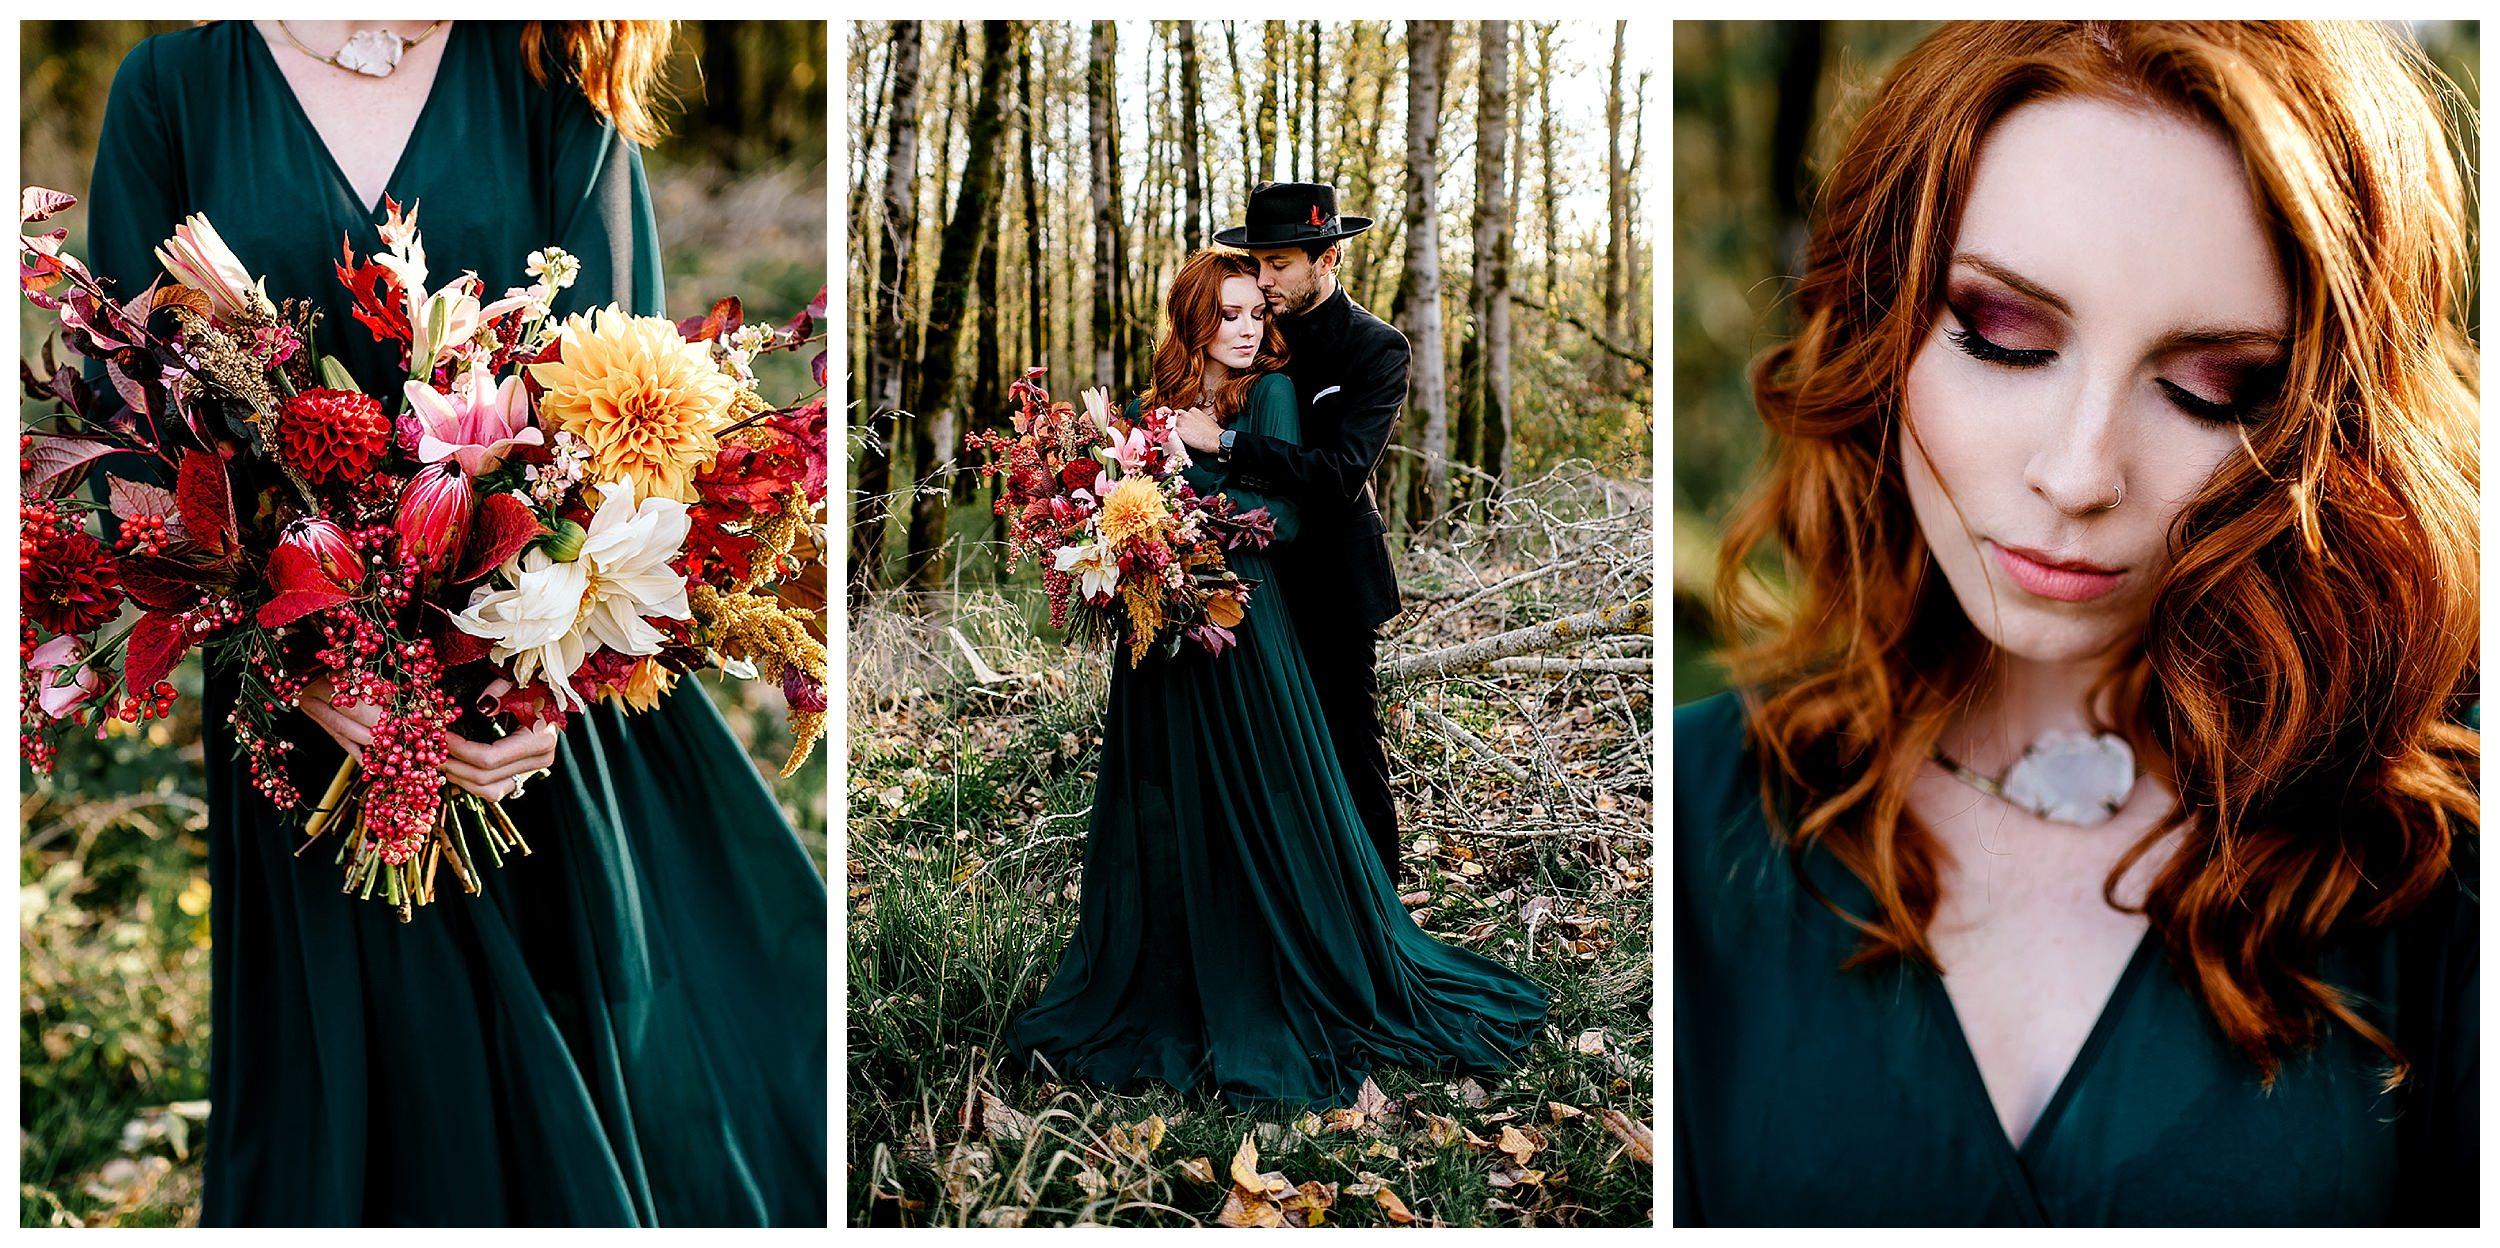 Portland-elopement-photographer-Autunm-wedding-inspiration-05.jpg